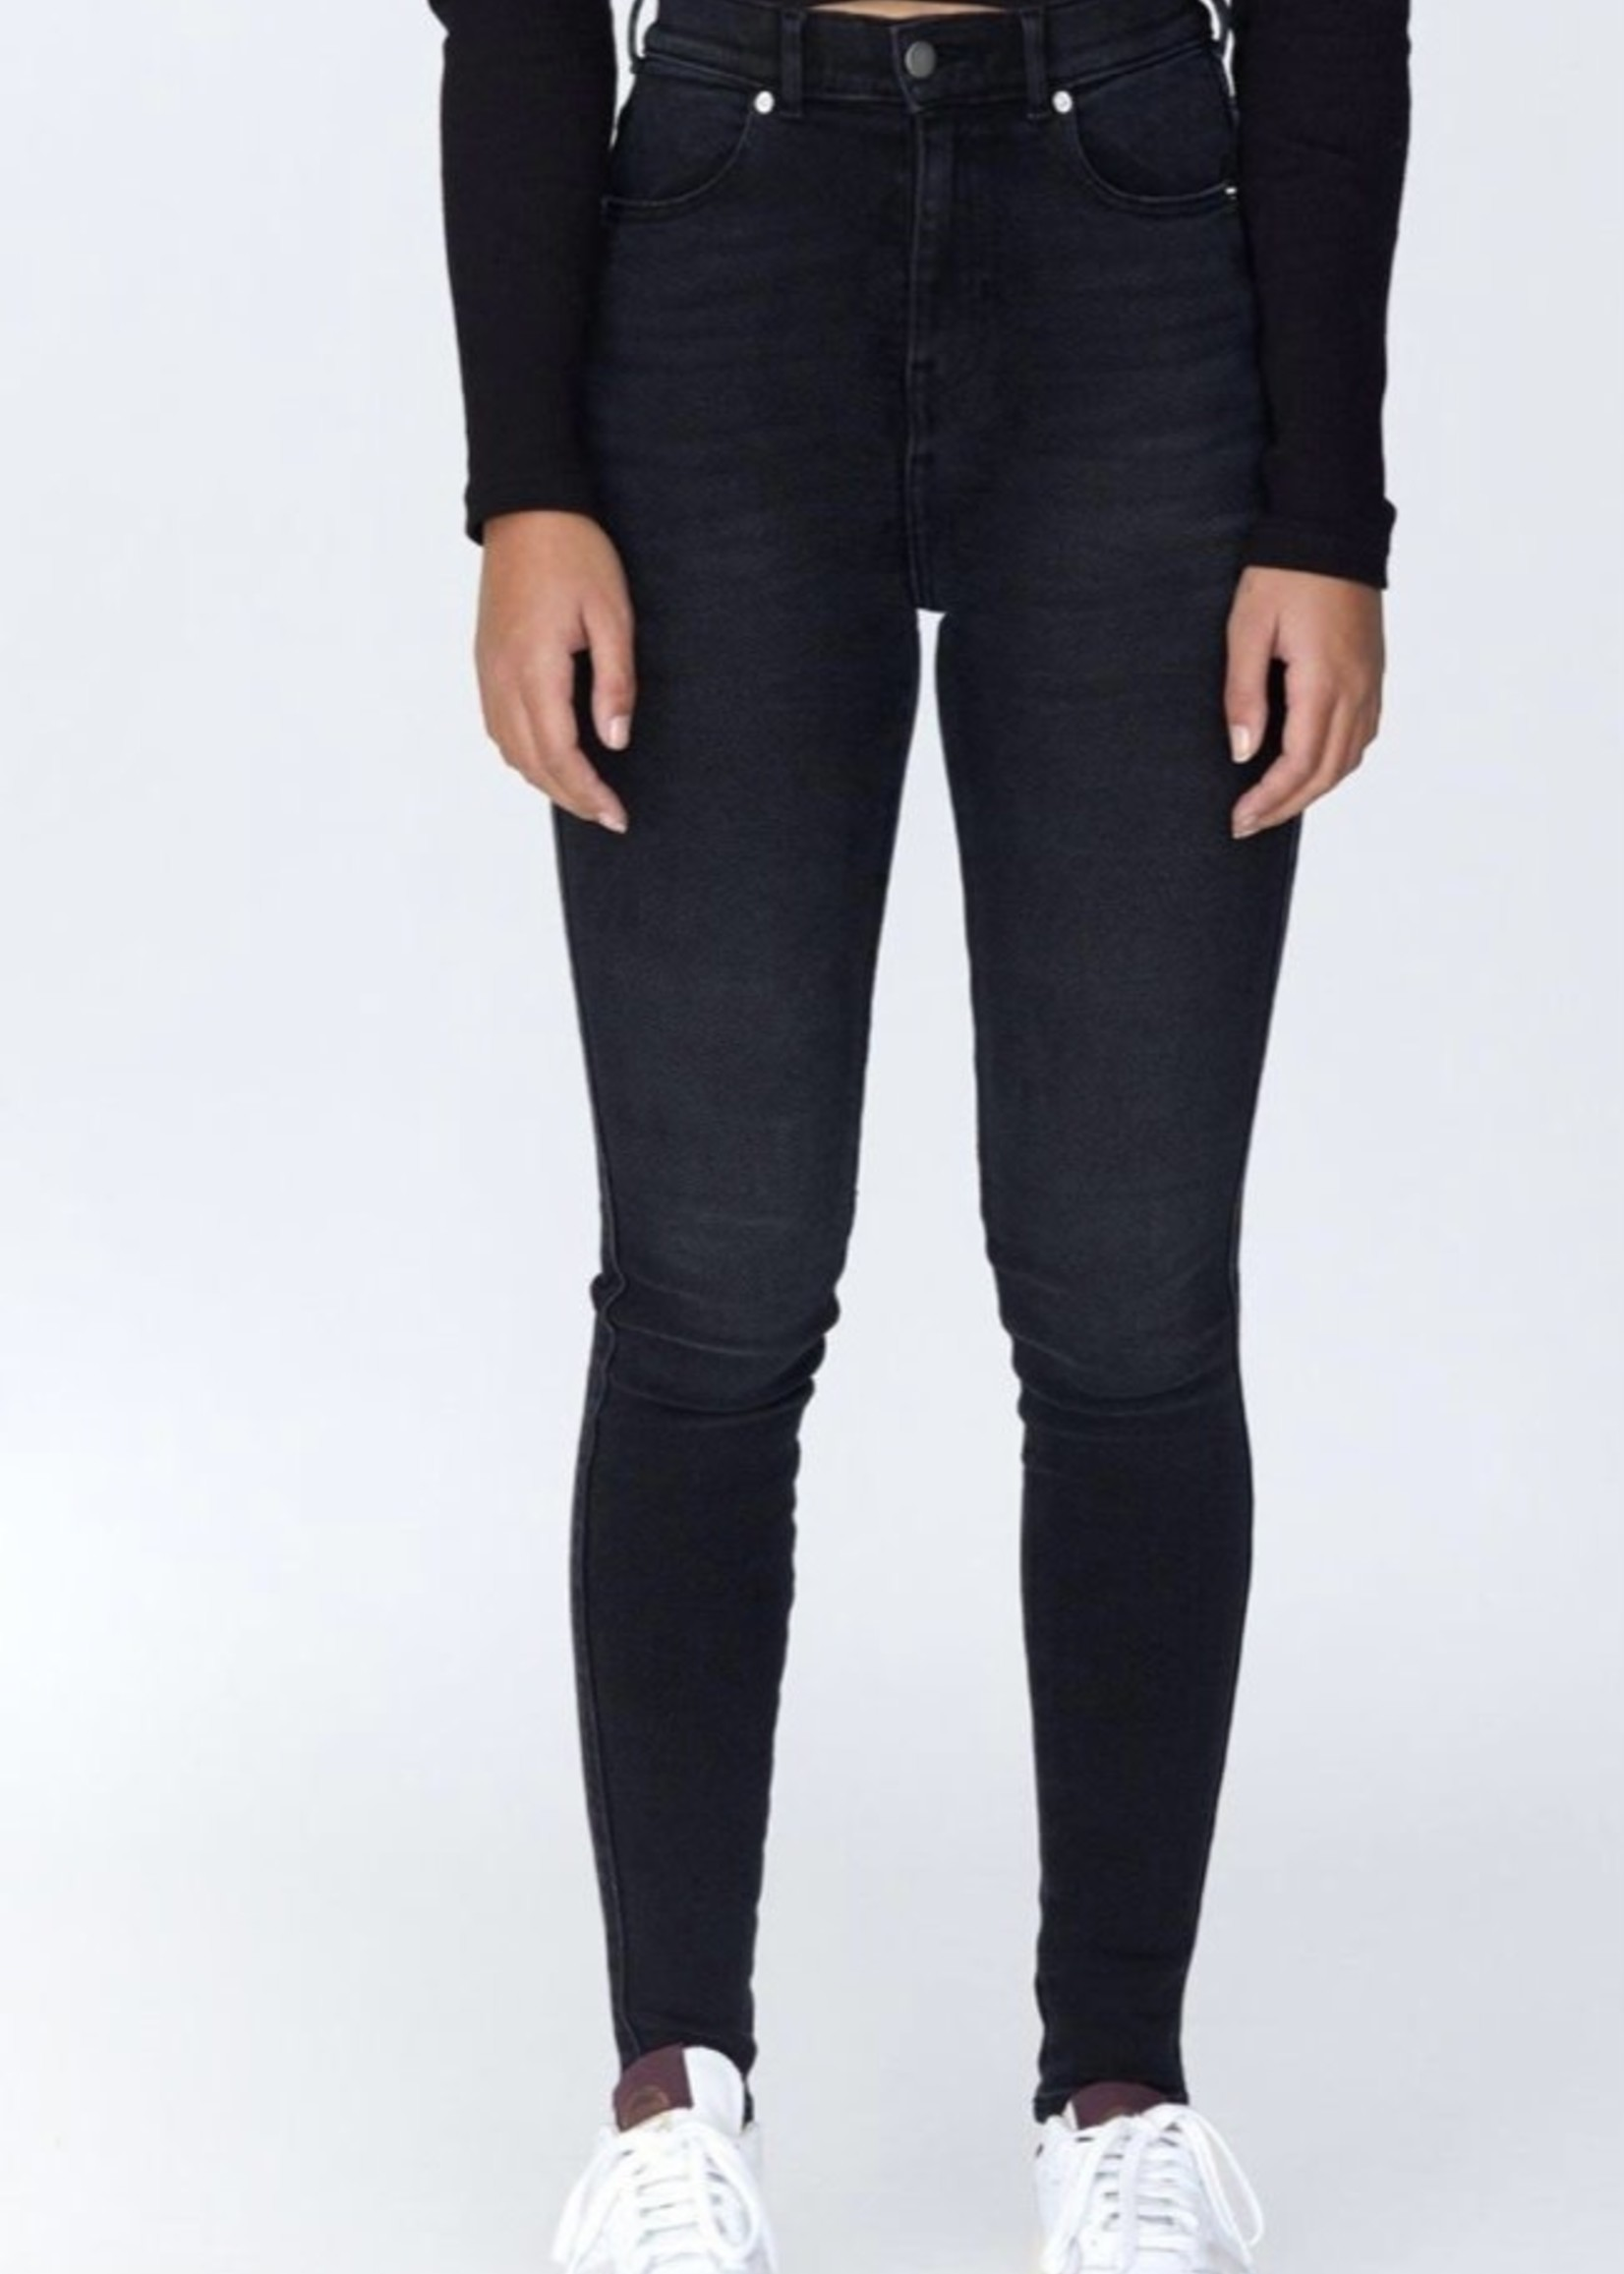 DR DENIM Moxy Jeans